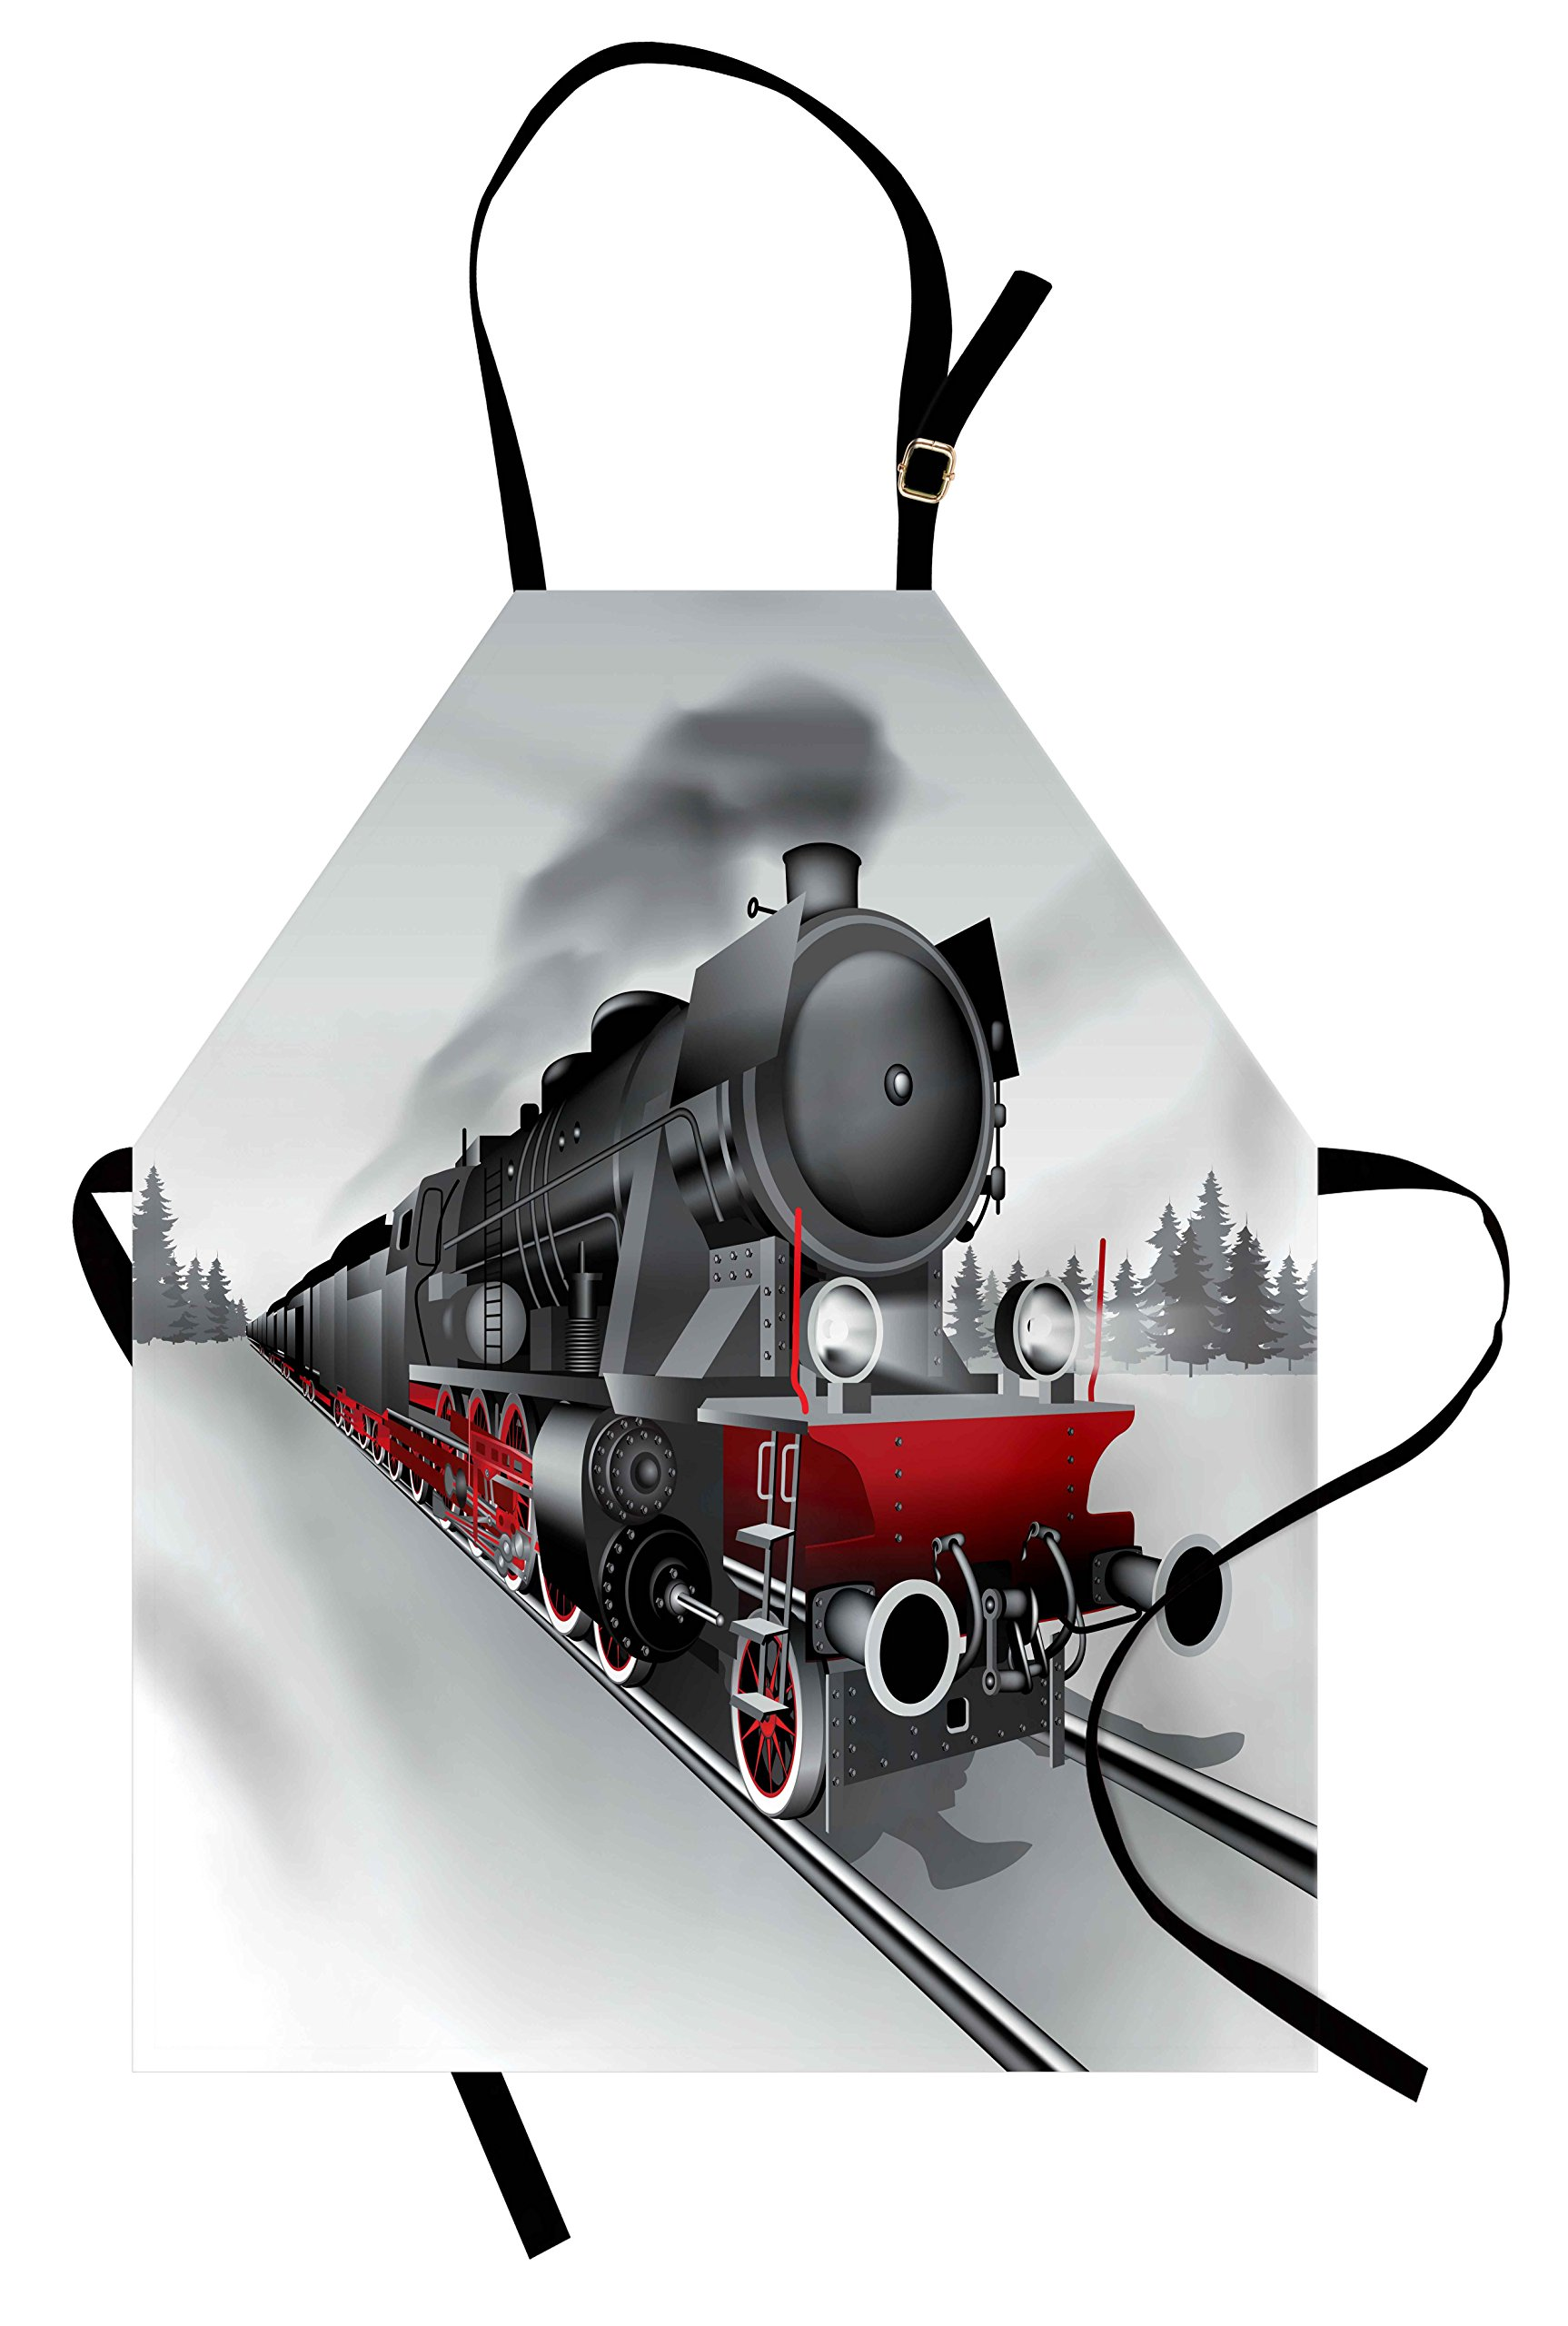 Ambesonne Steam Engine Apron, Locomotive Red Black Train on Steel Railway Track Travel Adventure Graphic Print, Unisex Kitchen Bib Apron with Adjustable Neck for Cooking Baking Gardening, Red Grey